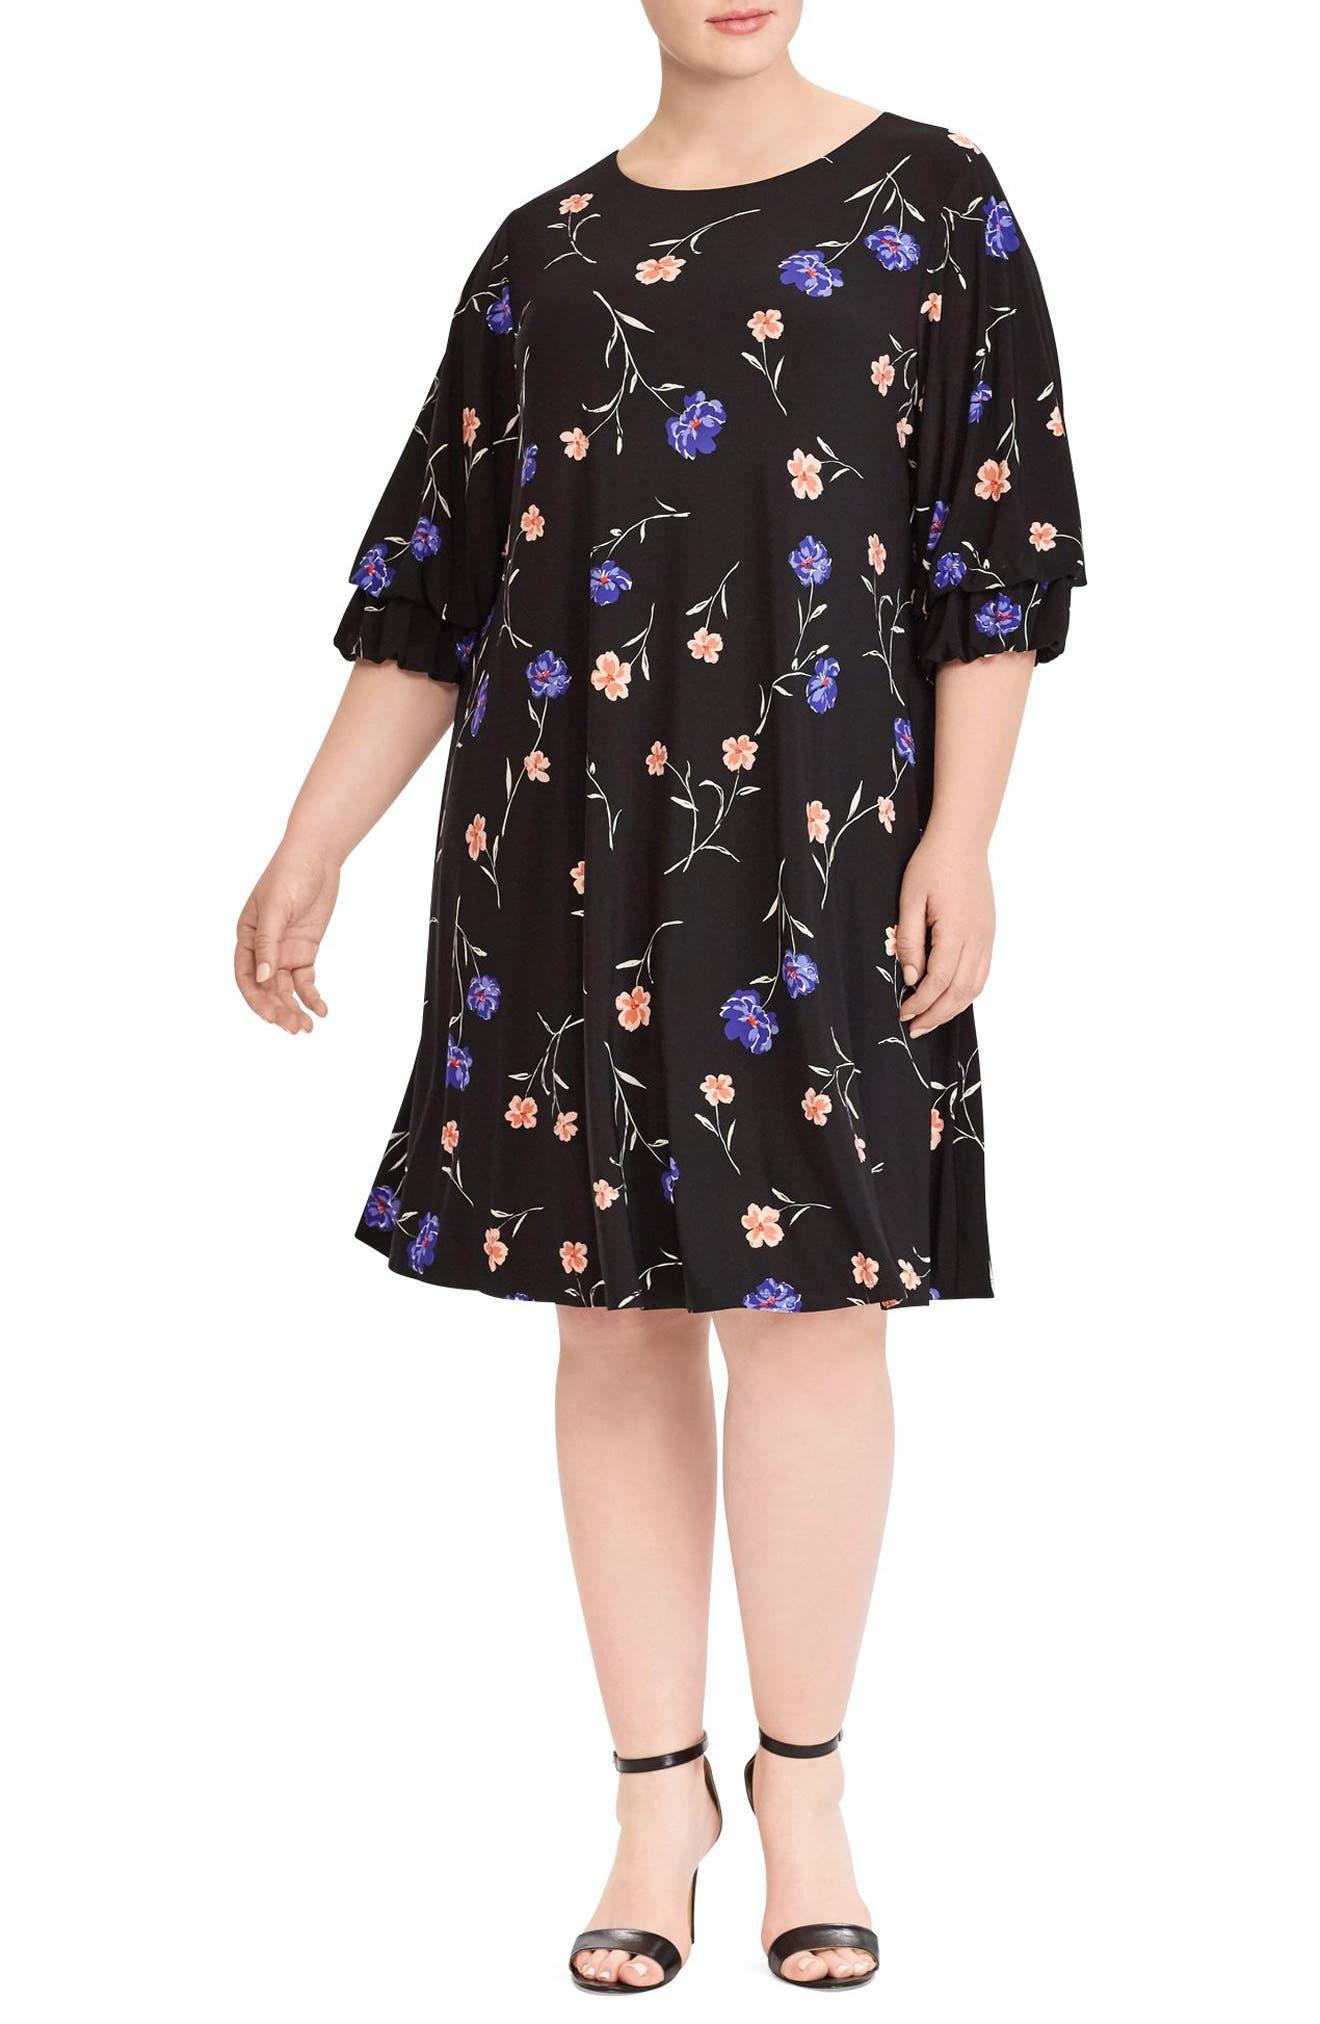 Ruffle Sleeve Floral Print Dress,                         Main,                         color, Black-Blue-Multi